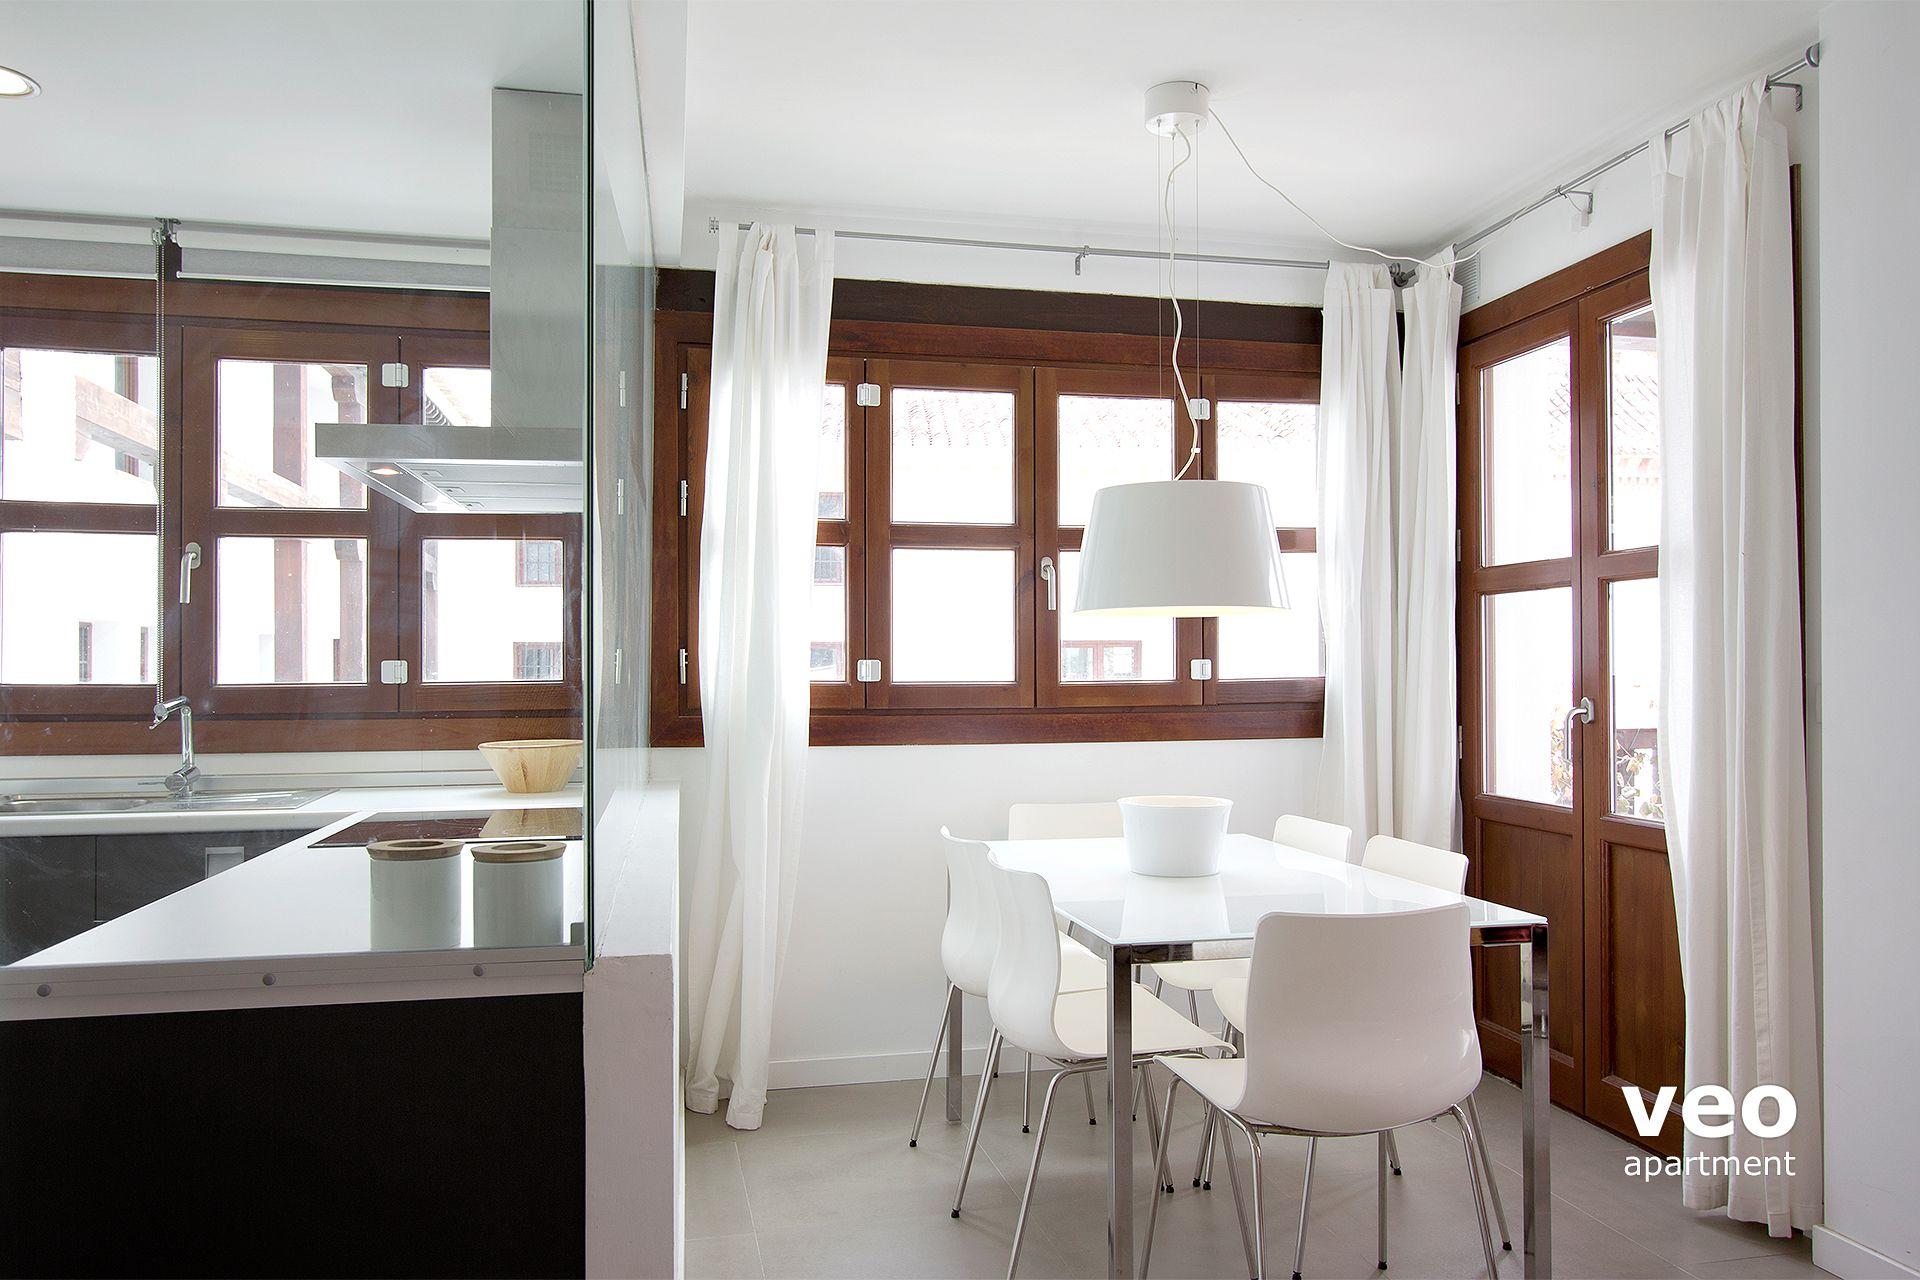 granada apartment san jos繝筰 alta street granada spain san jos繝筰 1